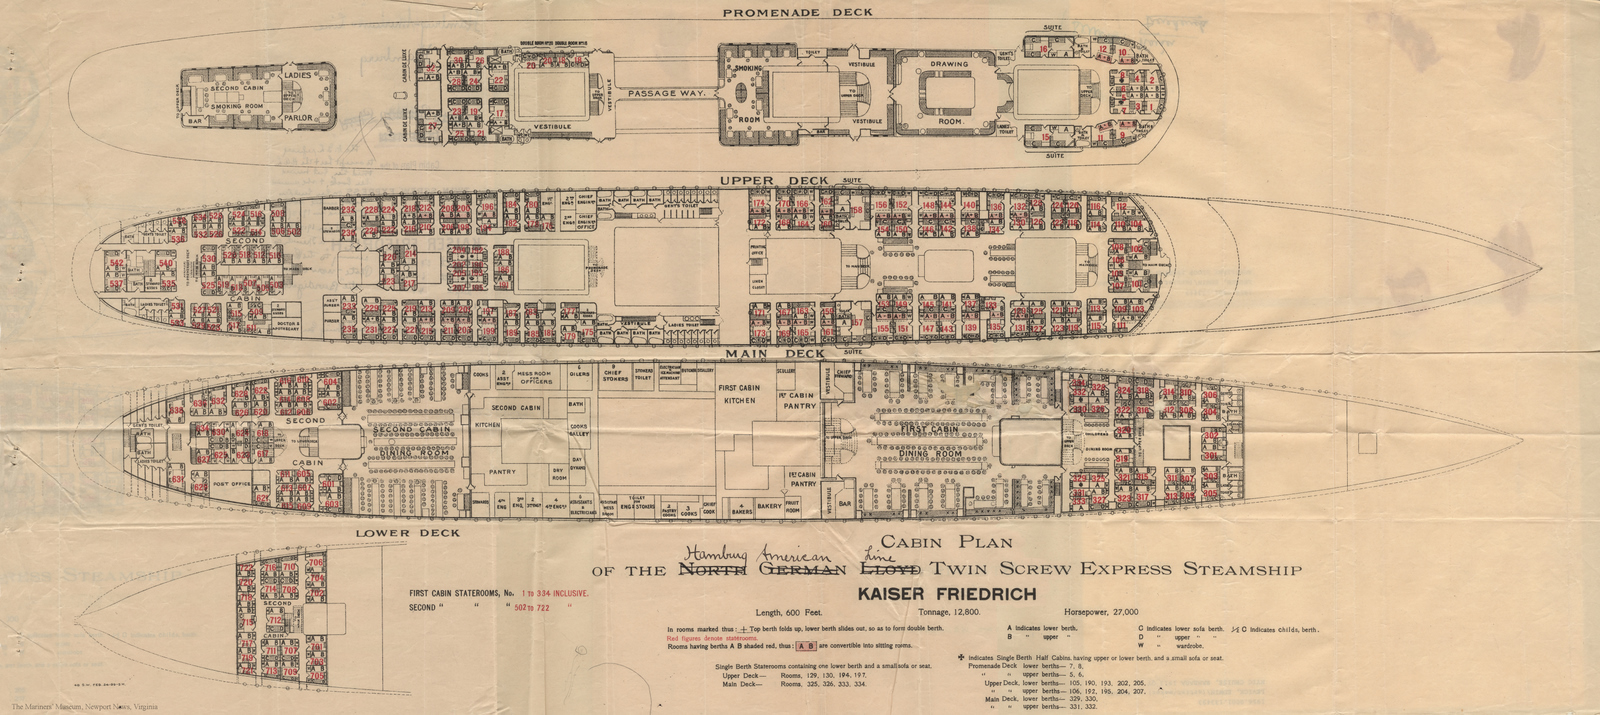 Kaiser Friedrich Accomodation Plans